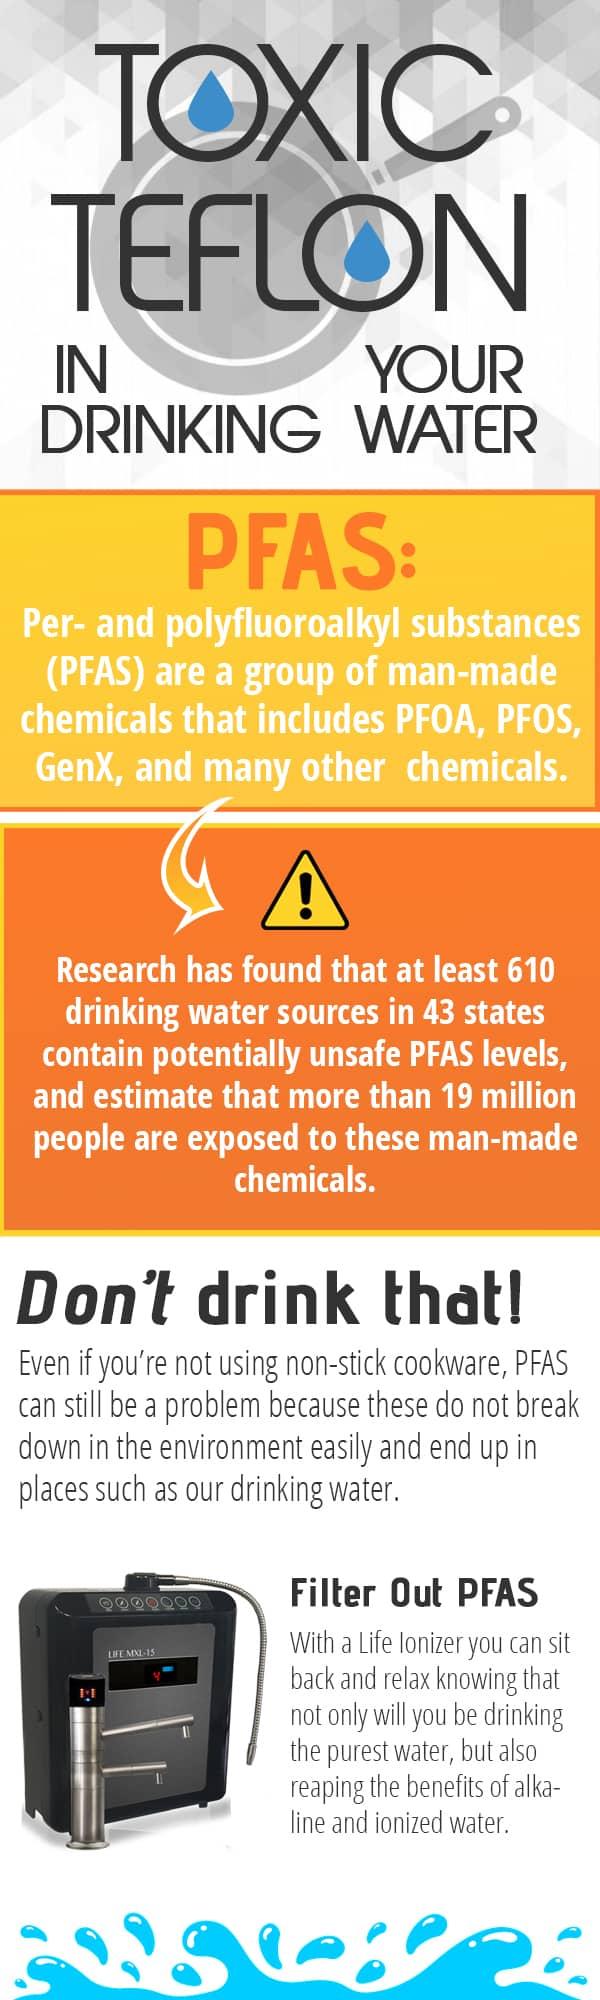 Toxic Teflon Article Infographic